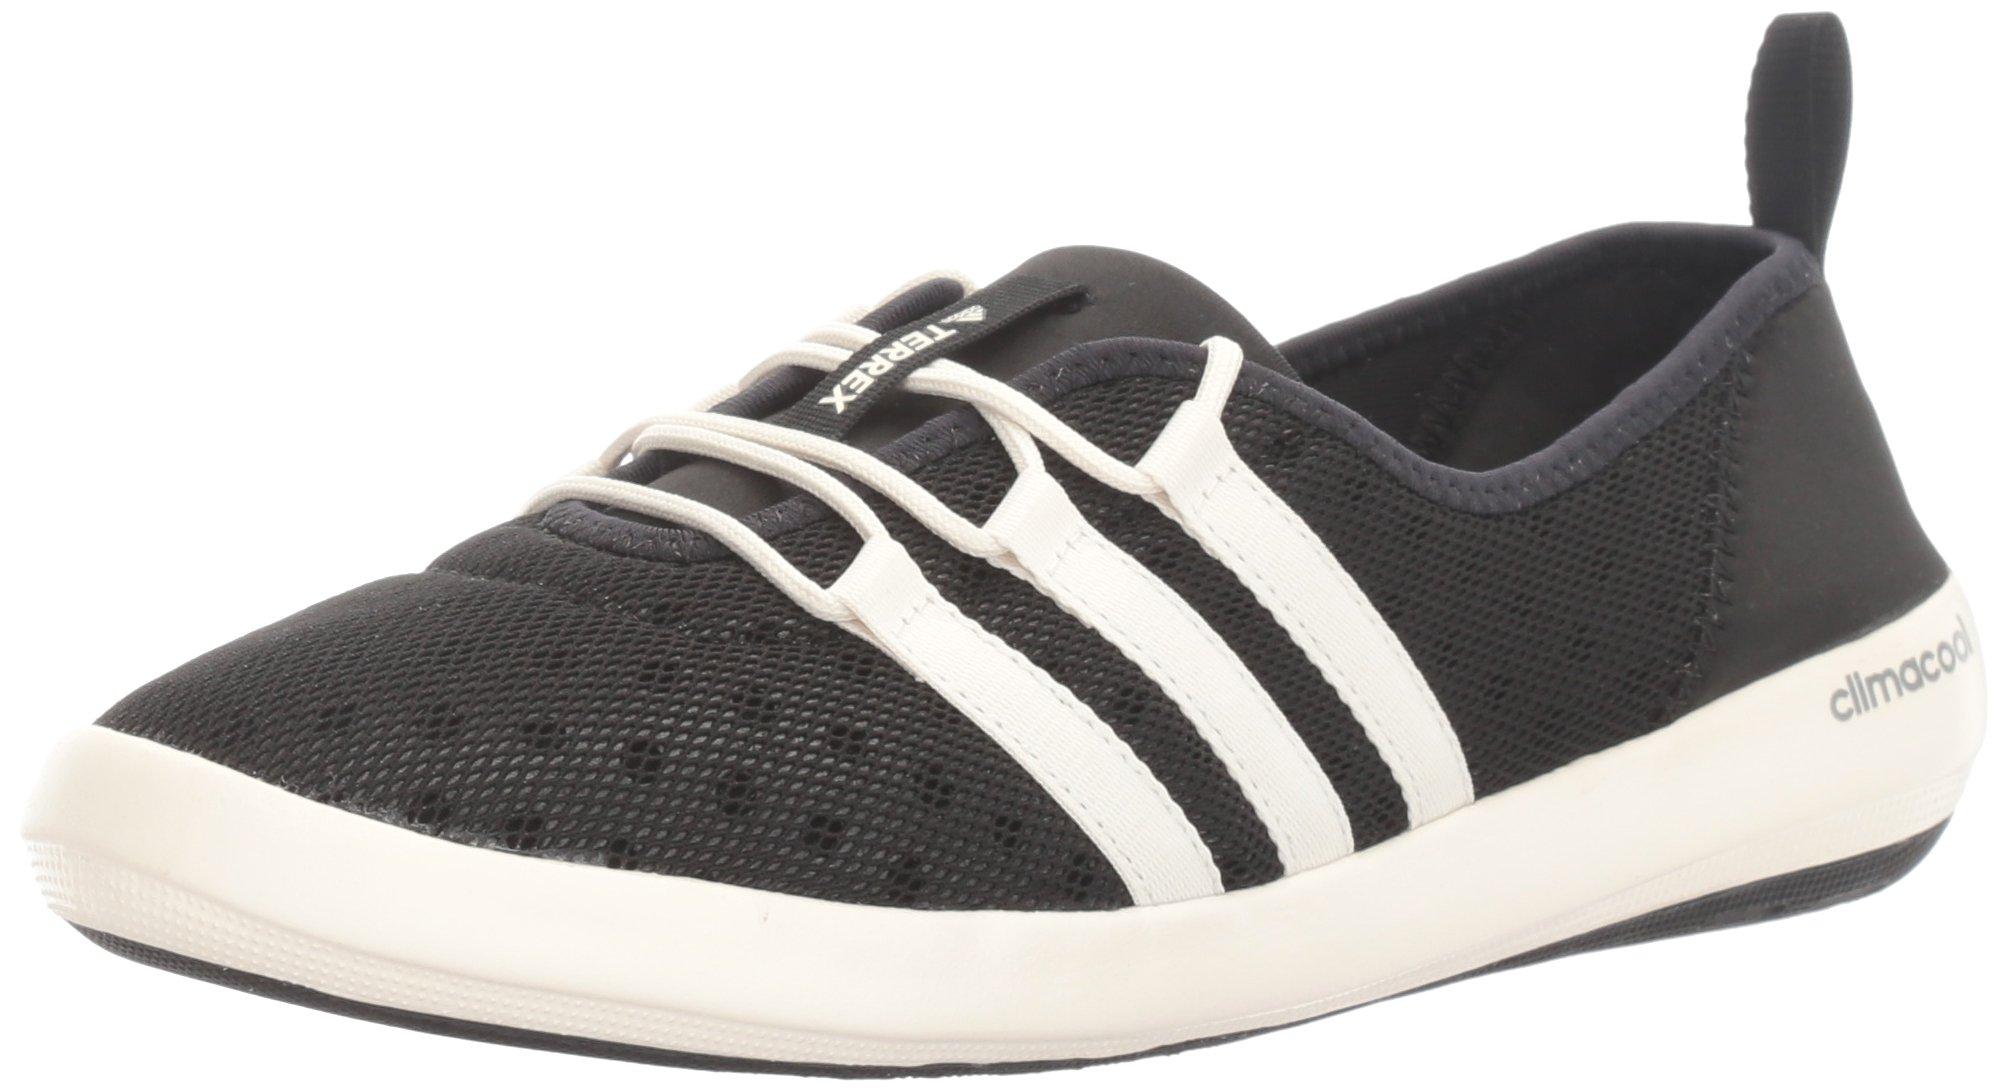 adidas outdoor Women's Terrex Climacool Boat Sleek Water Shoe, Black/Chalk White/Matte Silver, 10 M US